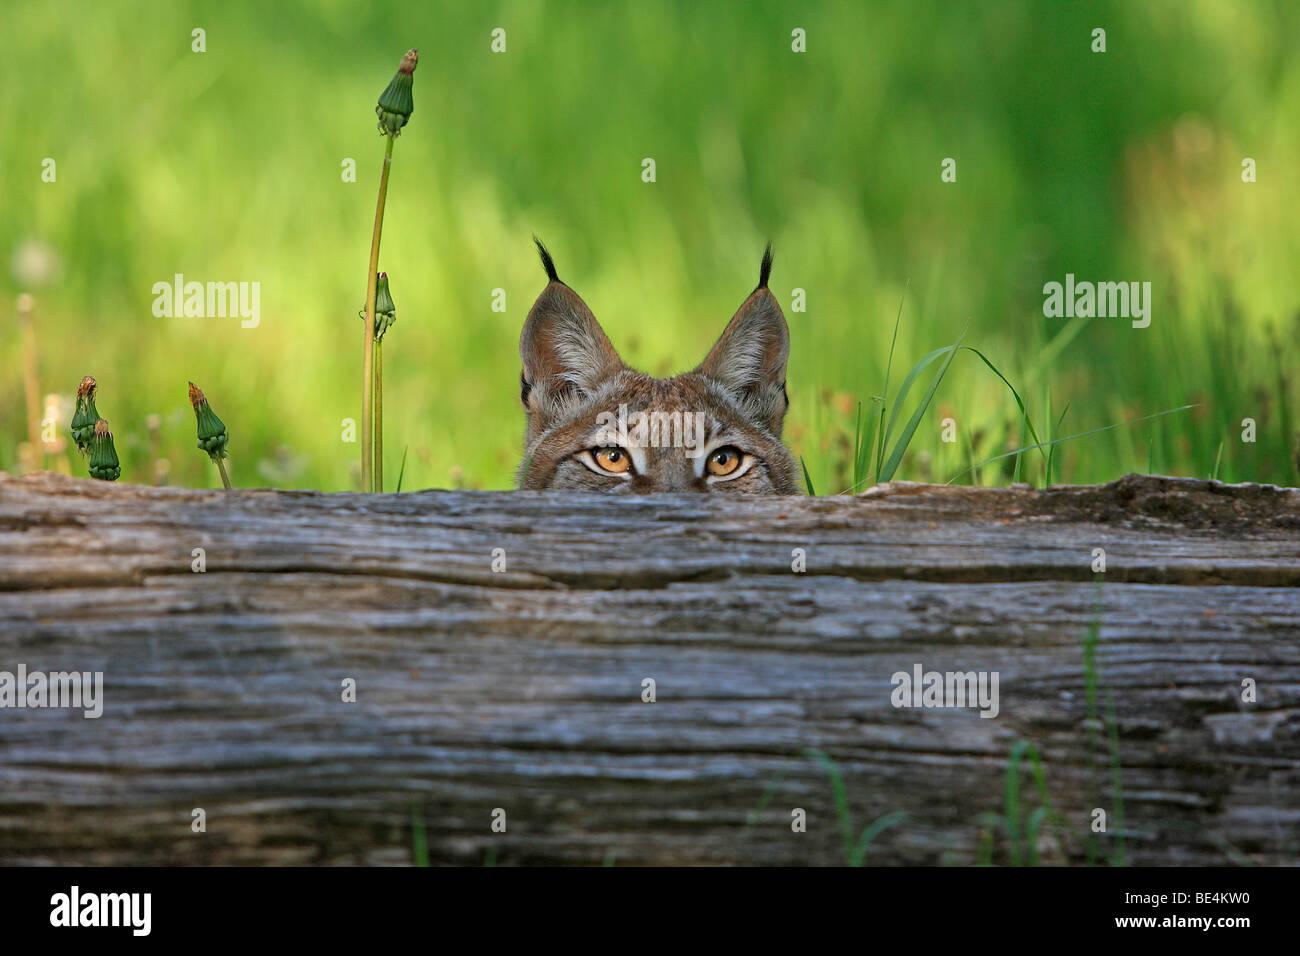 European Lynx (Felis lynx, Lynx lynx) peering over a fallen tree. - Stock Image